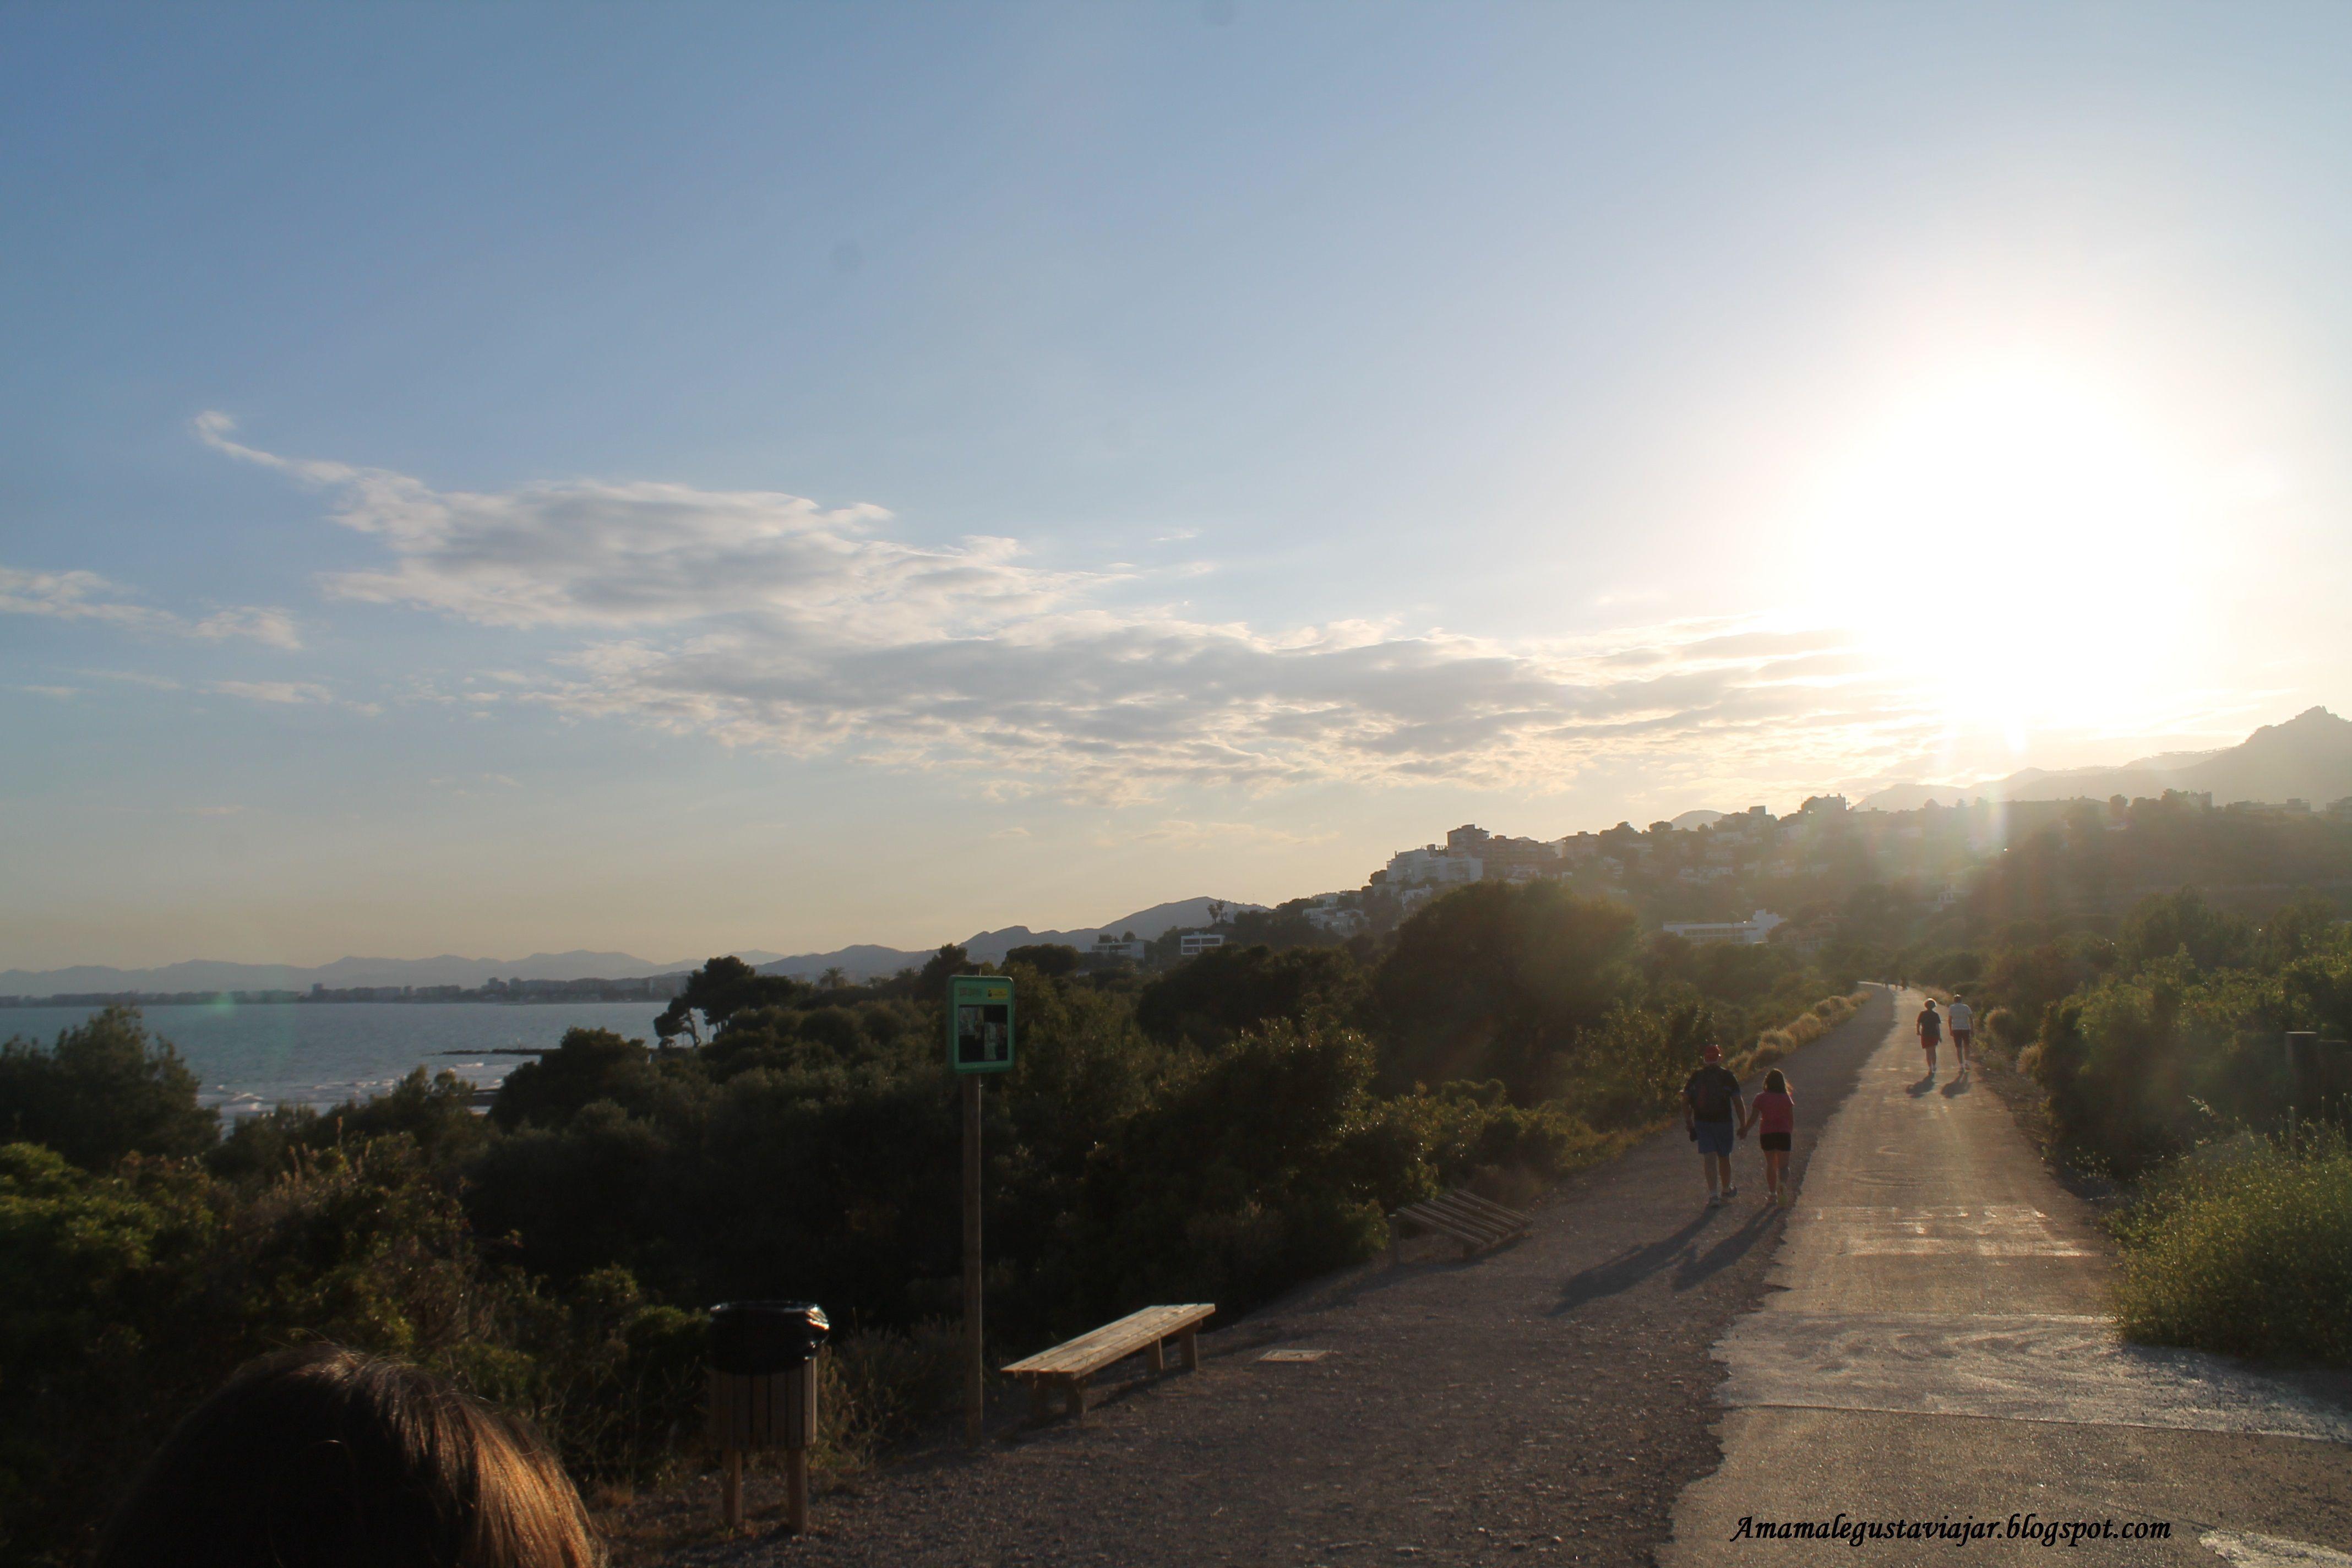 Atardecer En La Vía Verde Oropesa Del Mar Benicasim Sunset Outdoor Celestial